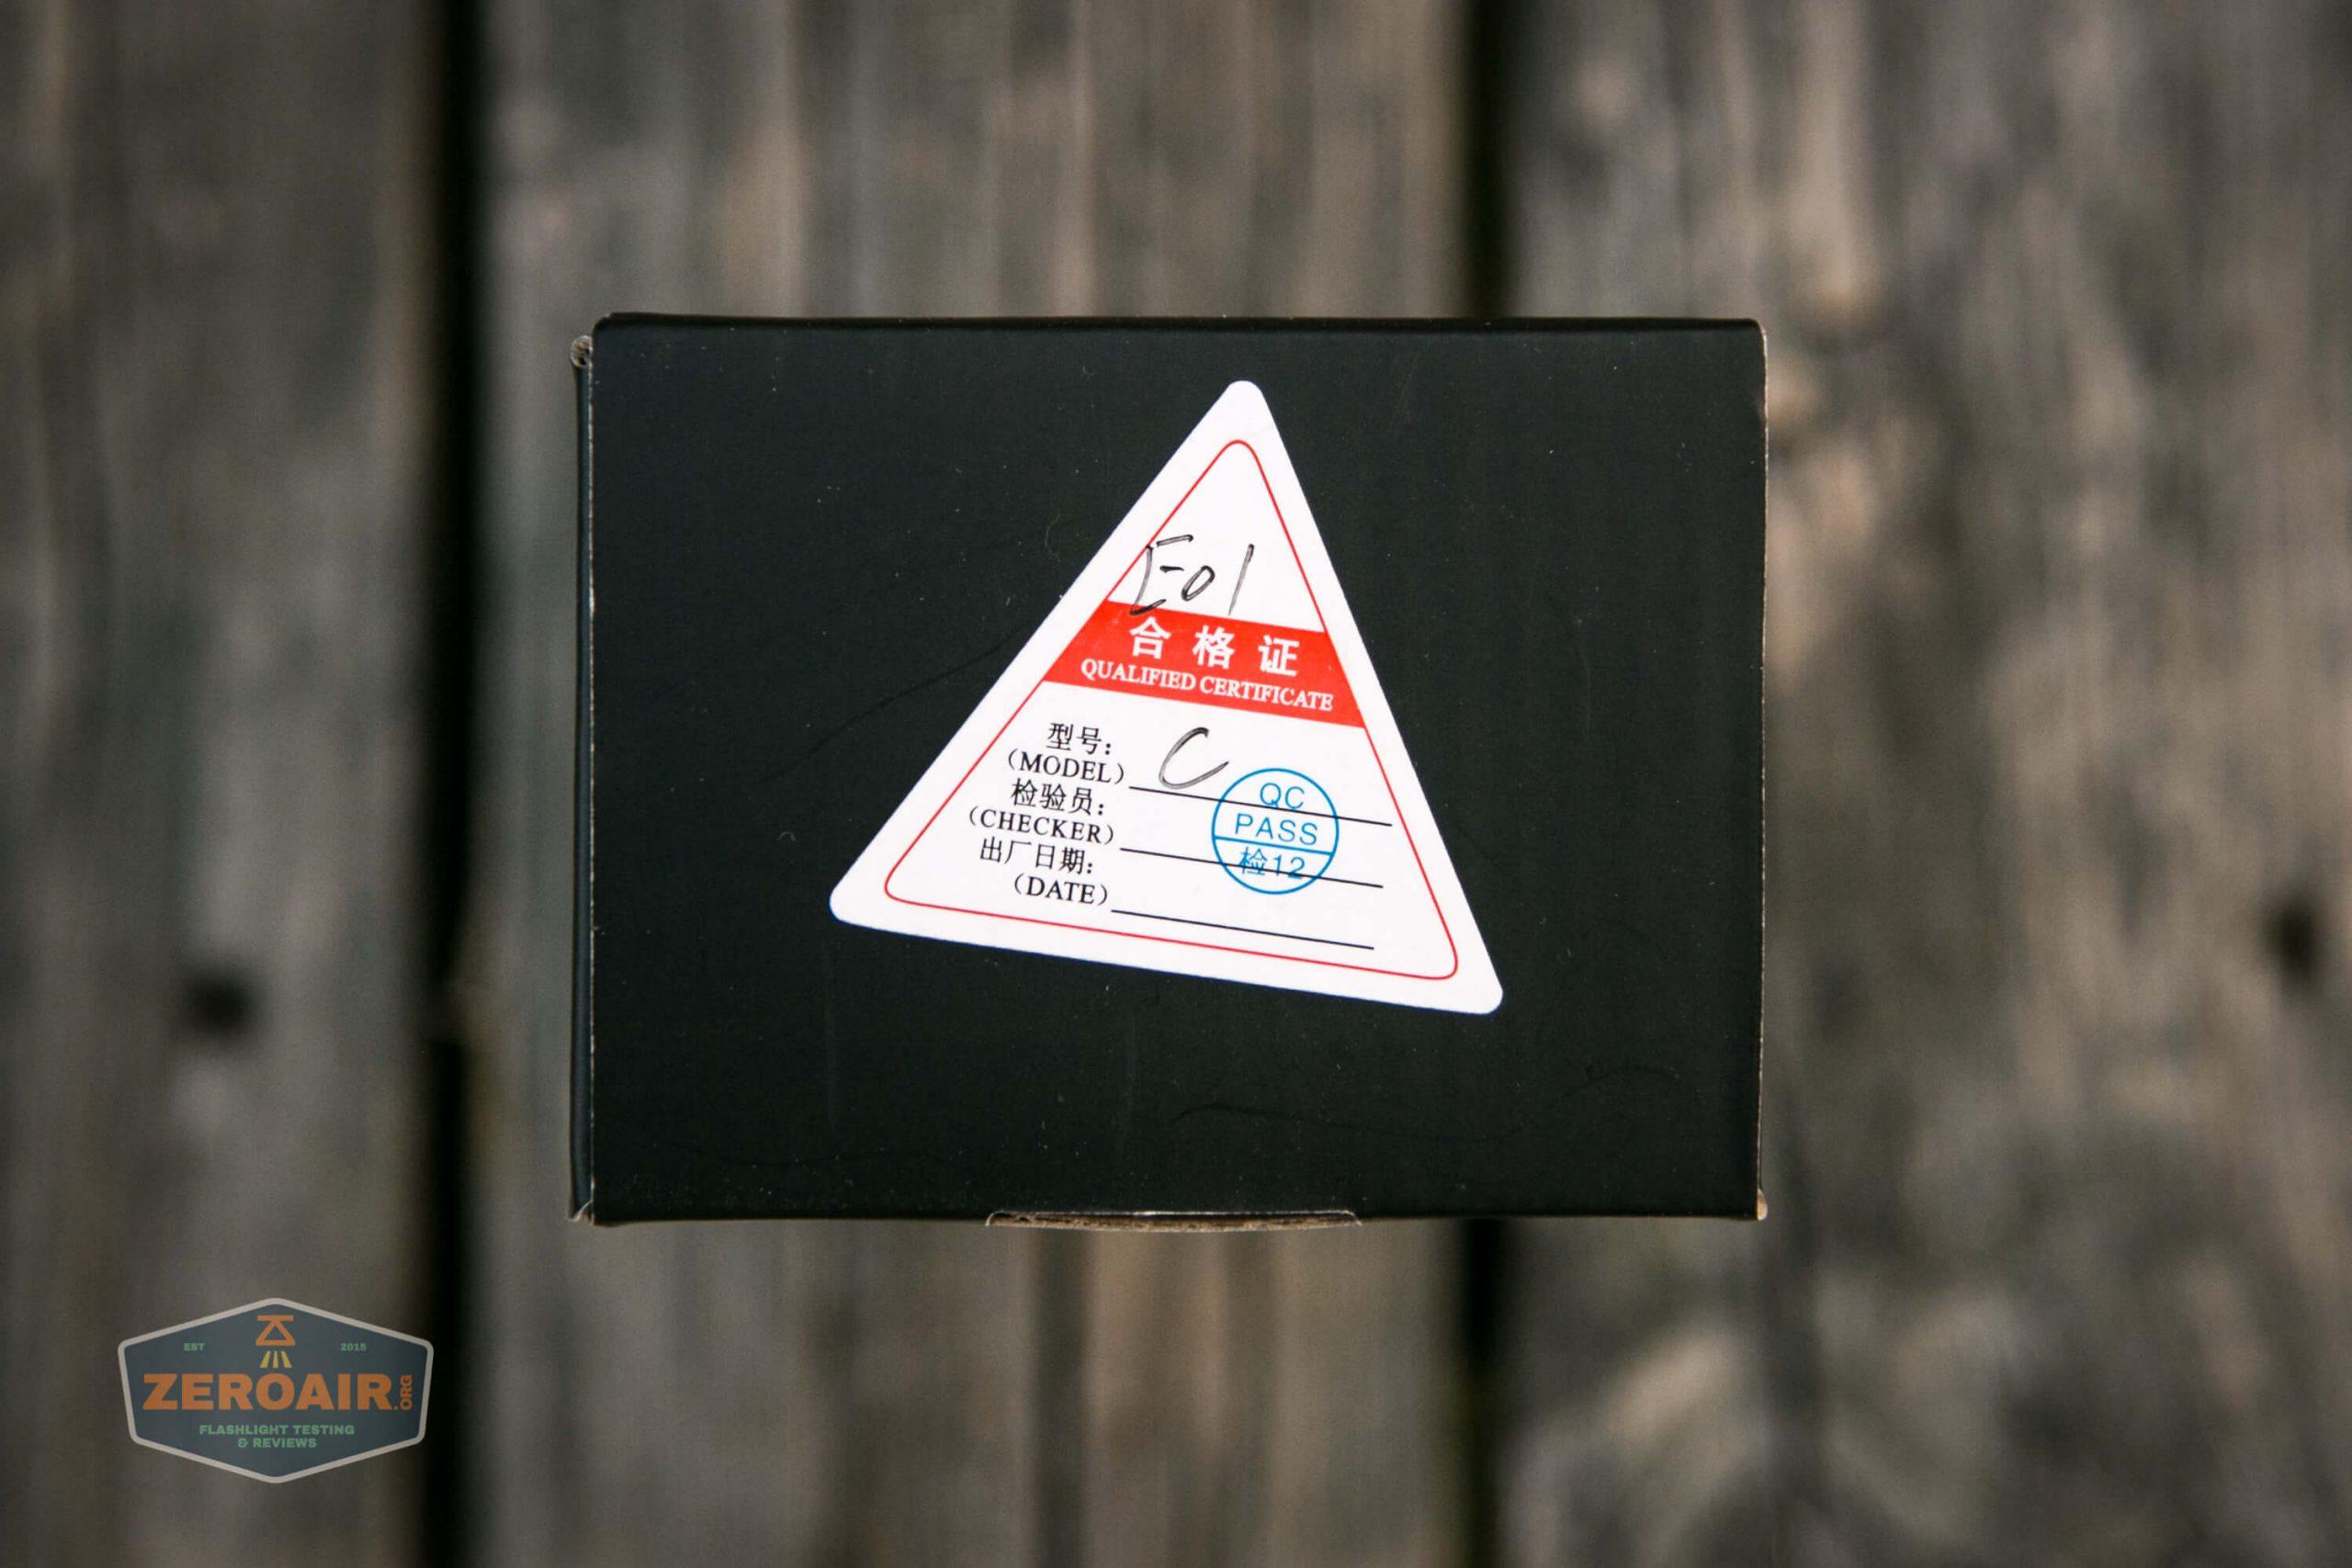 fireflylite e01 luminus sst-40 21700 box top